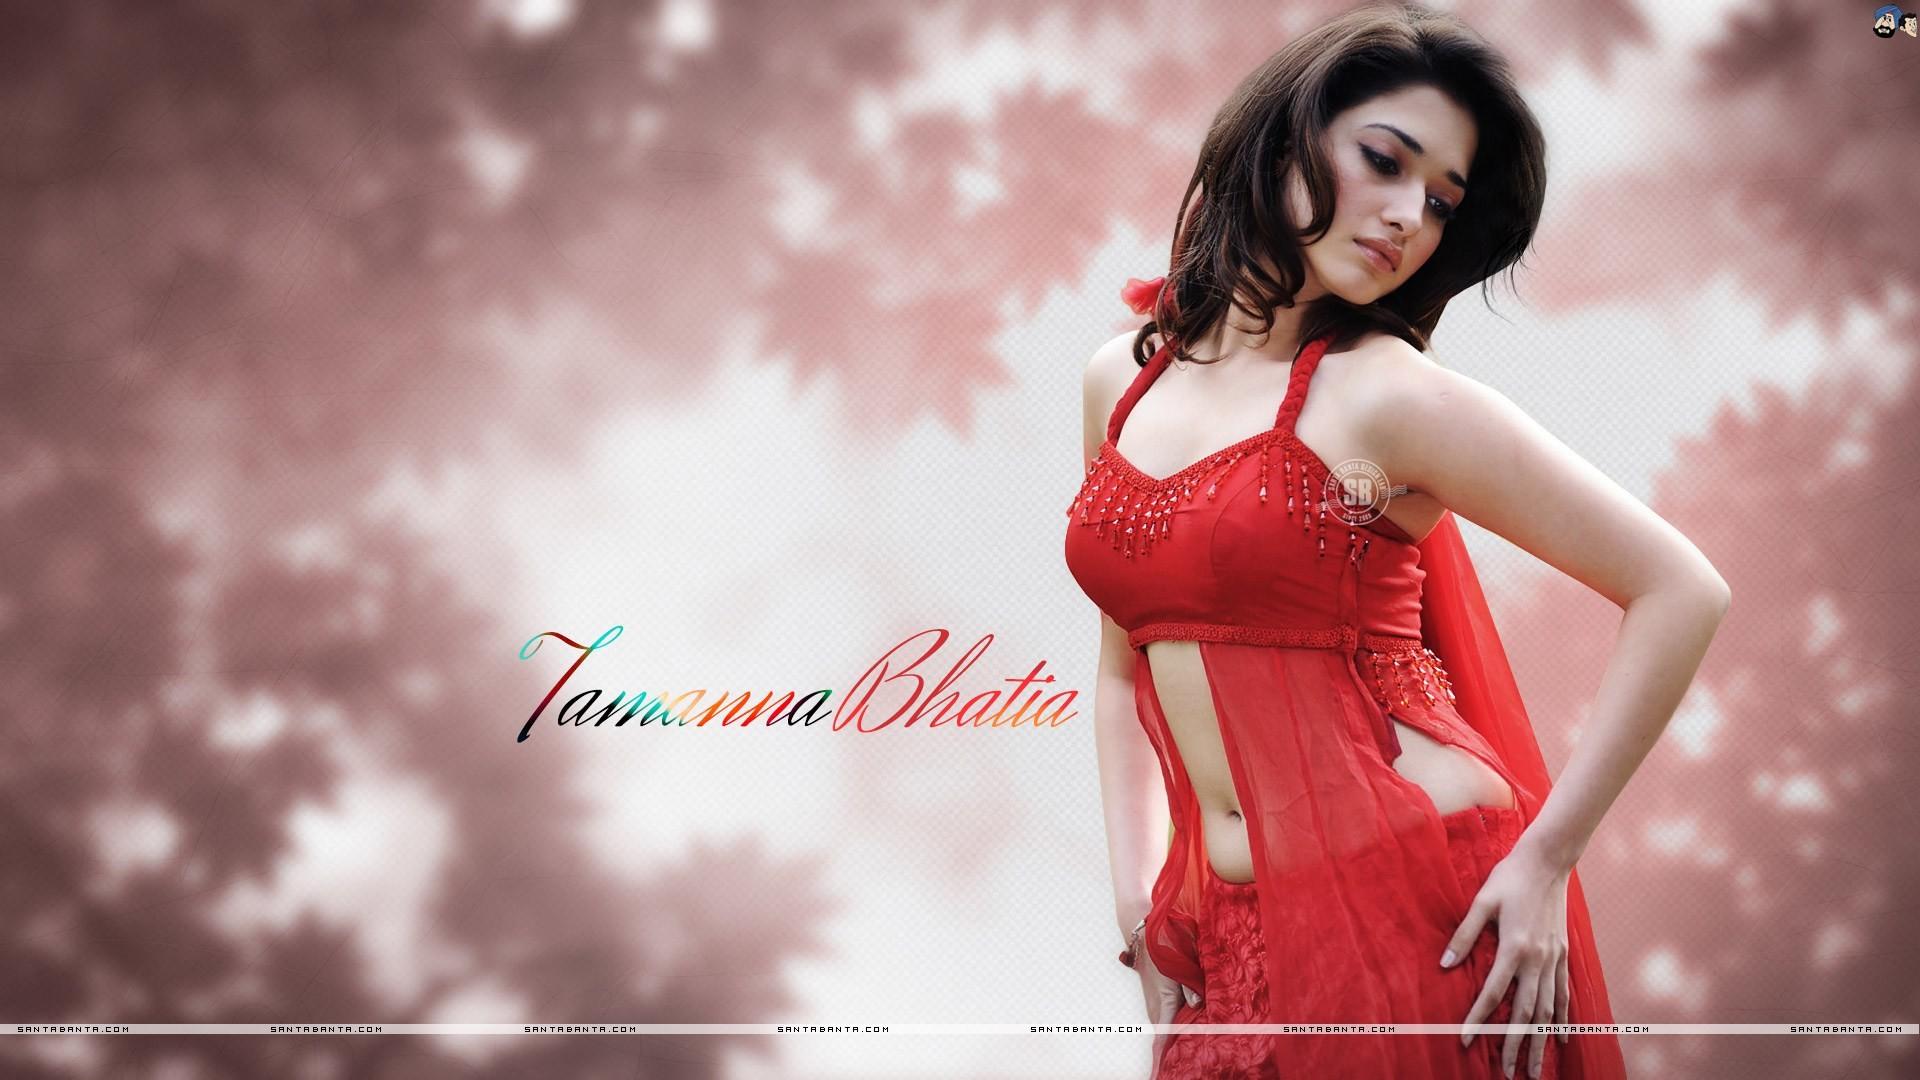 Tamanna Bhatia Hd Wallpapers 1920x1080 83 Images